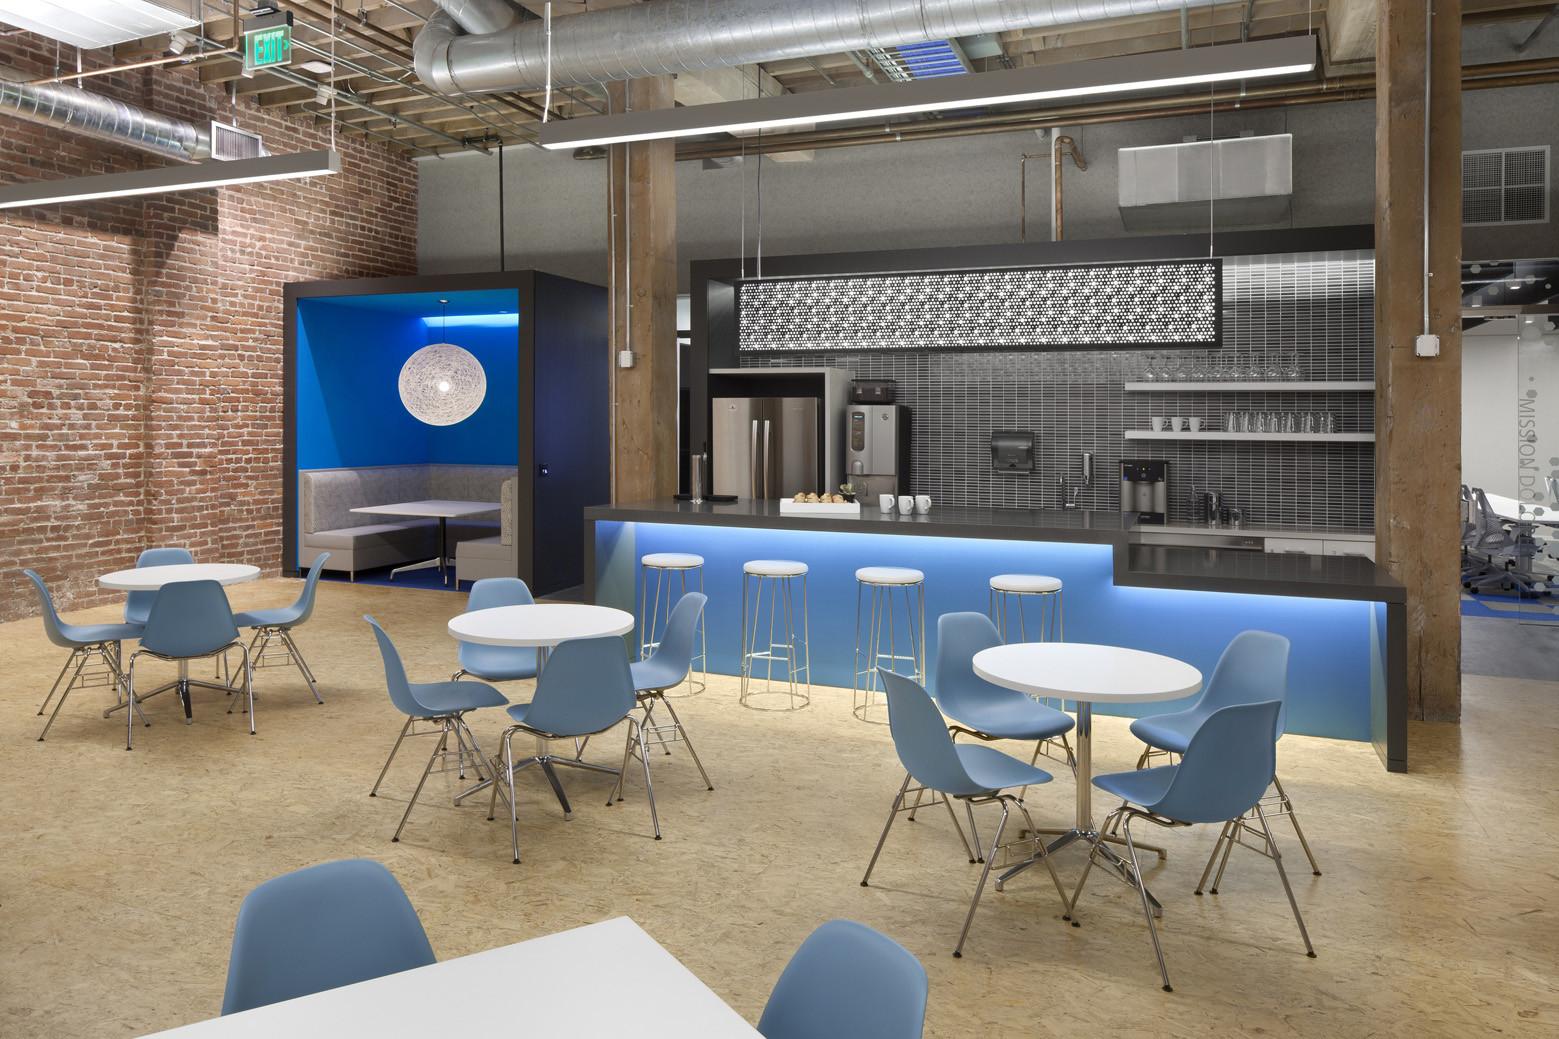 Adobe 410 townsend valerio dewalt train associates - Muebles de cafeteria ...